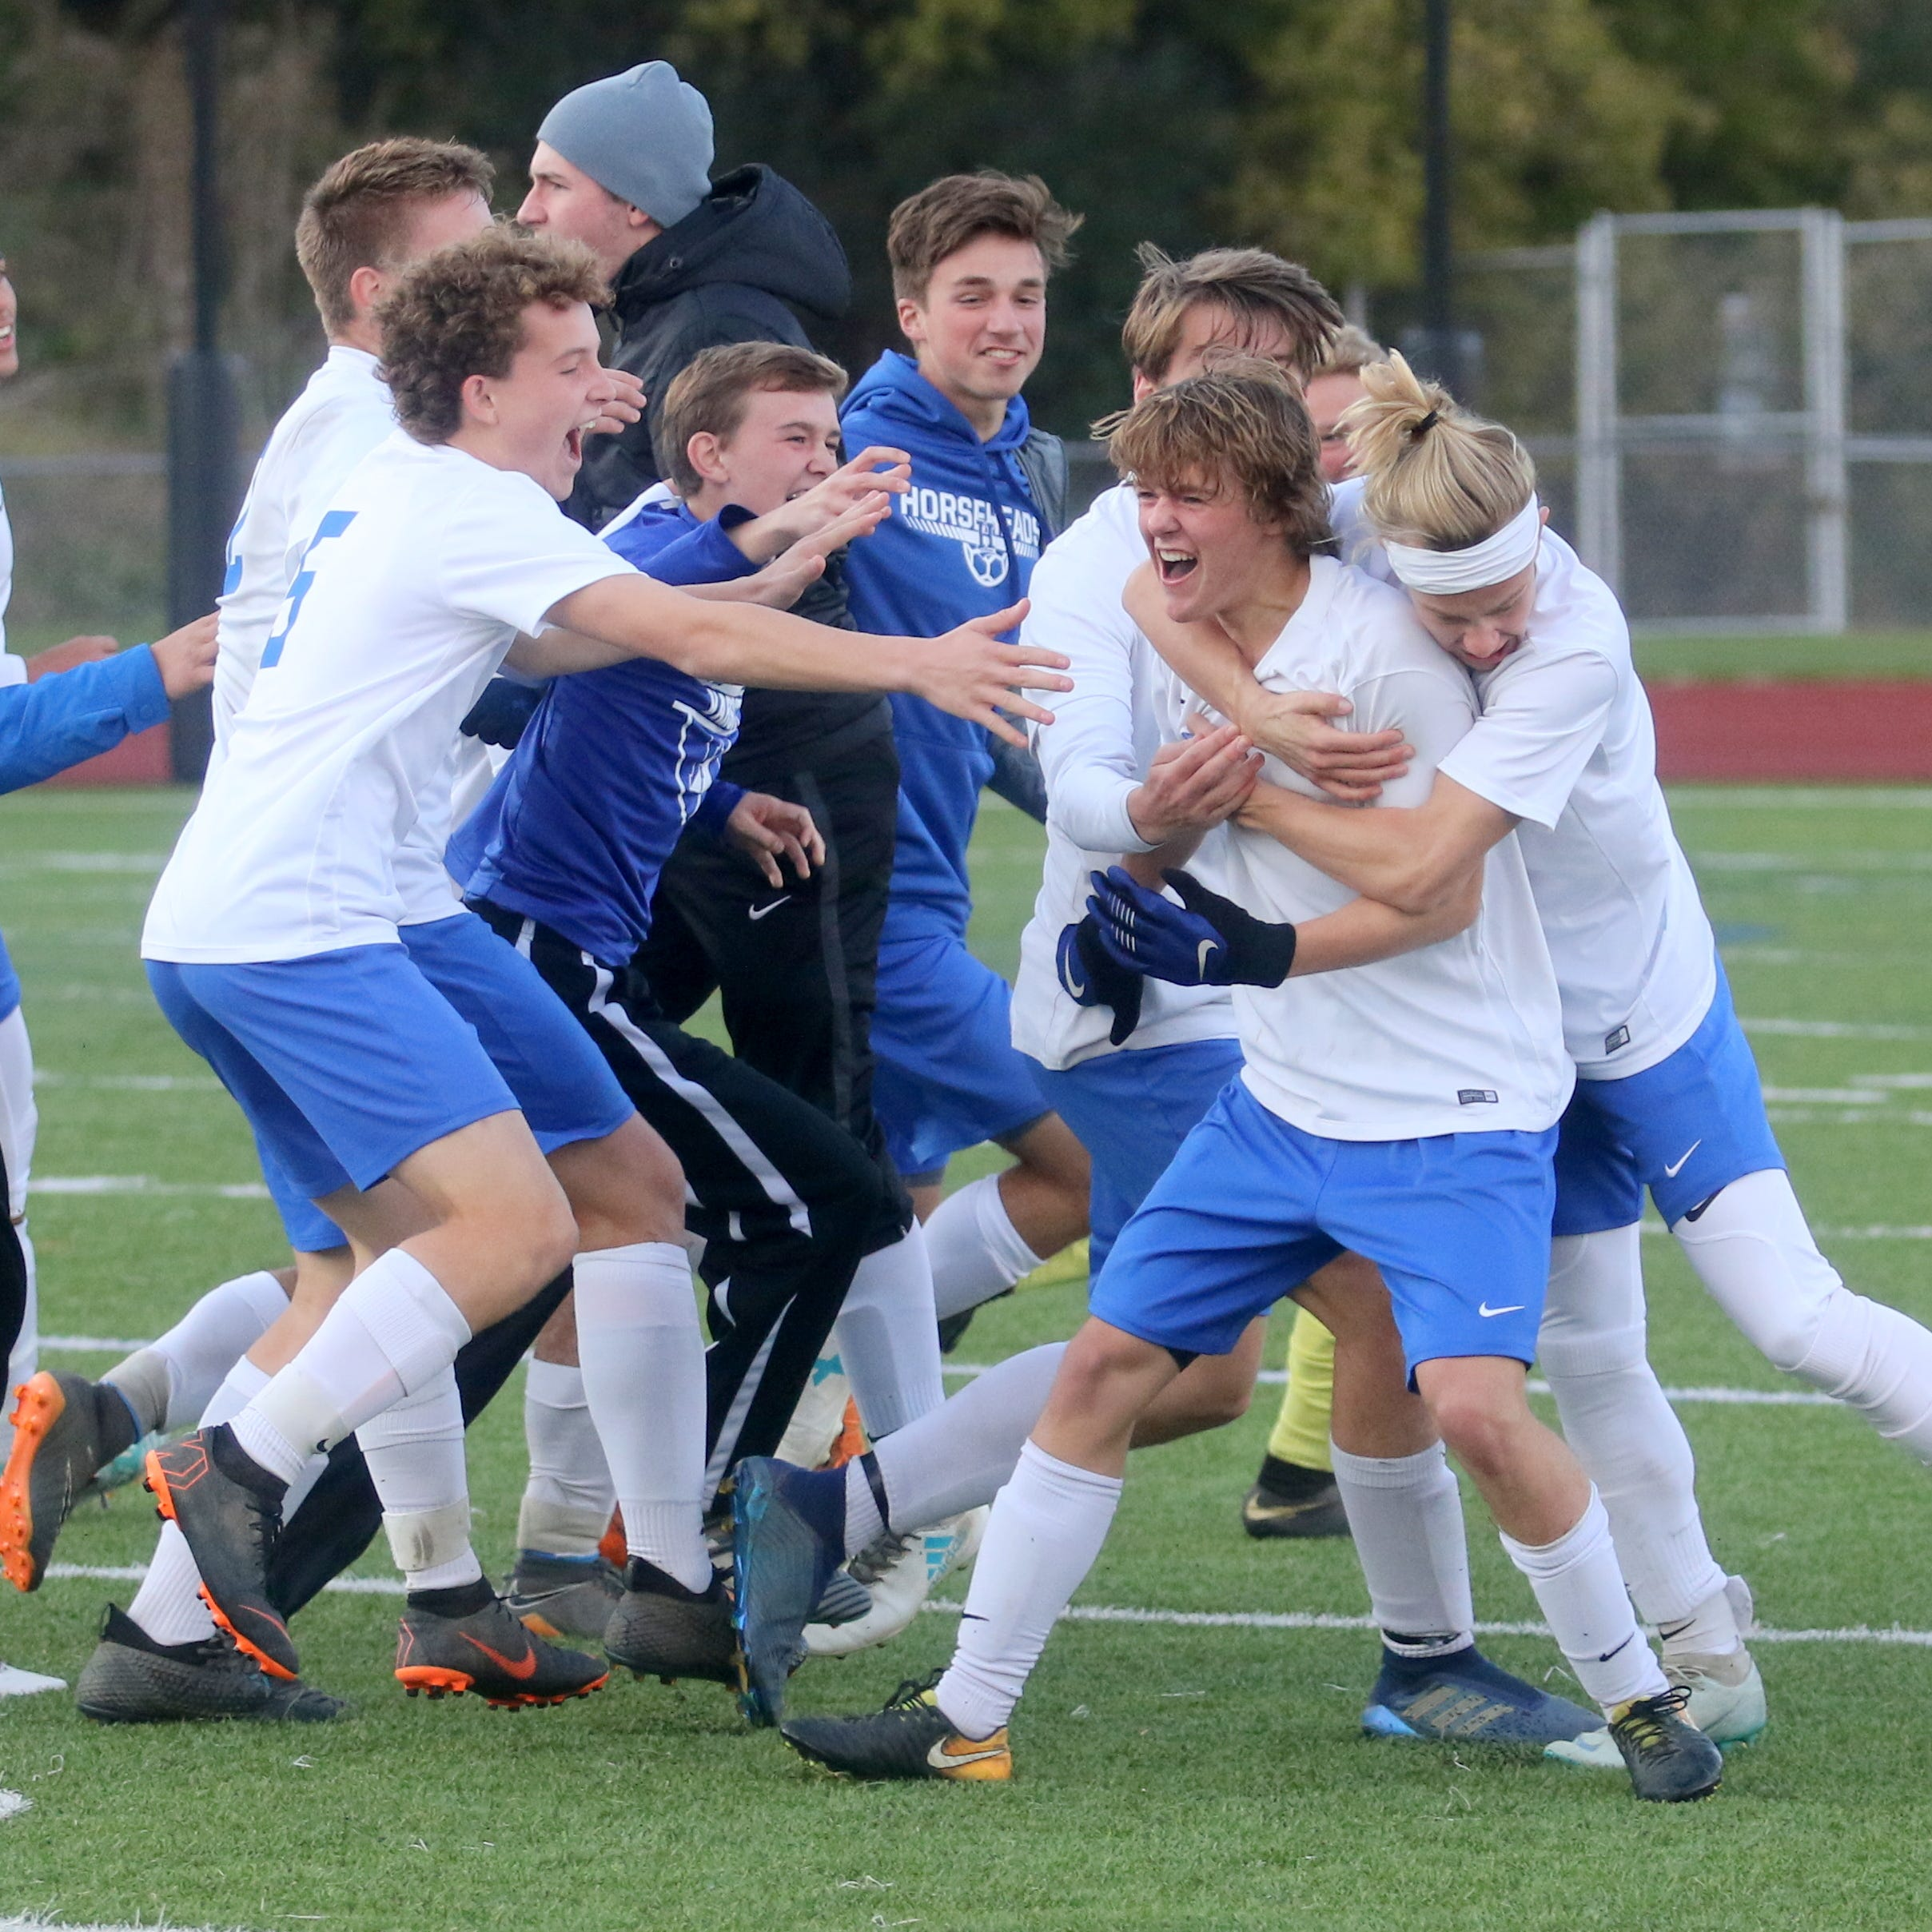 Thorpe's OT winner sends Horseheads past Elmira in Class AA boys soccer semifinal